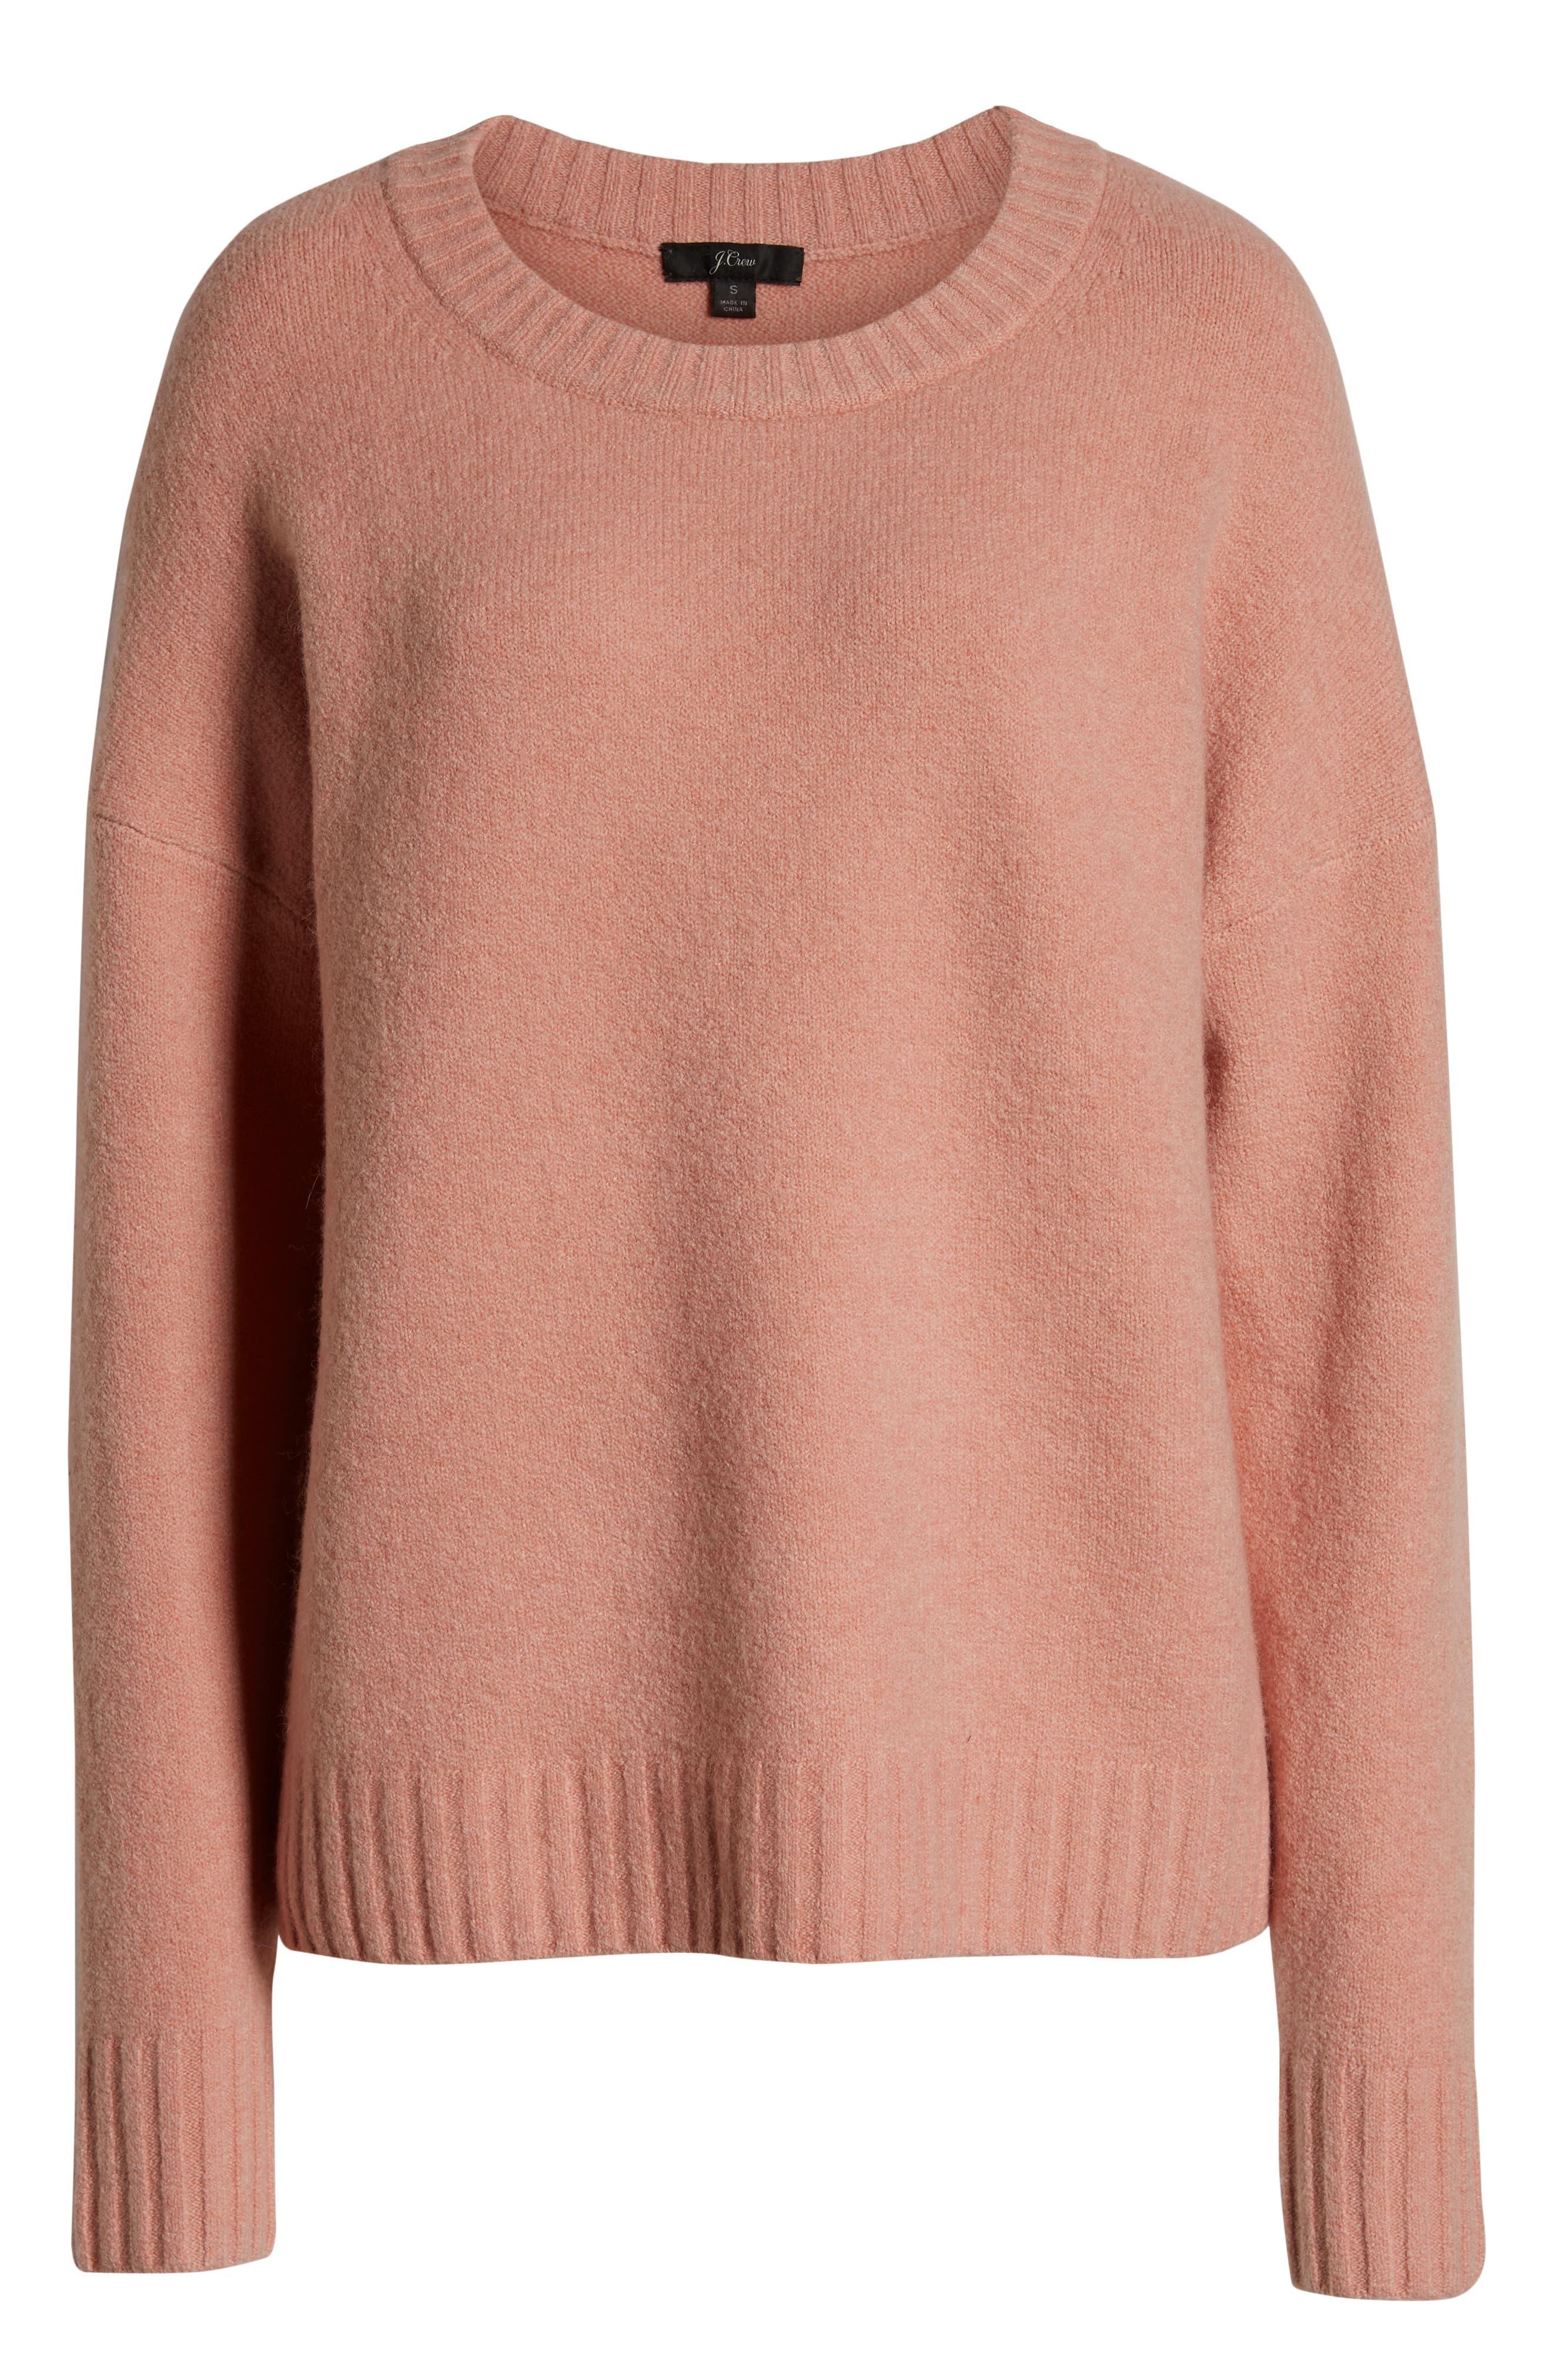 J.CREW, Supersoft Oversize Crewneck Sweater, Alternate thumbnail 6, color, 650